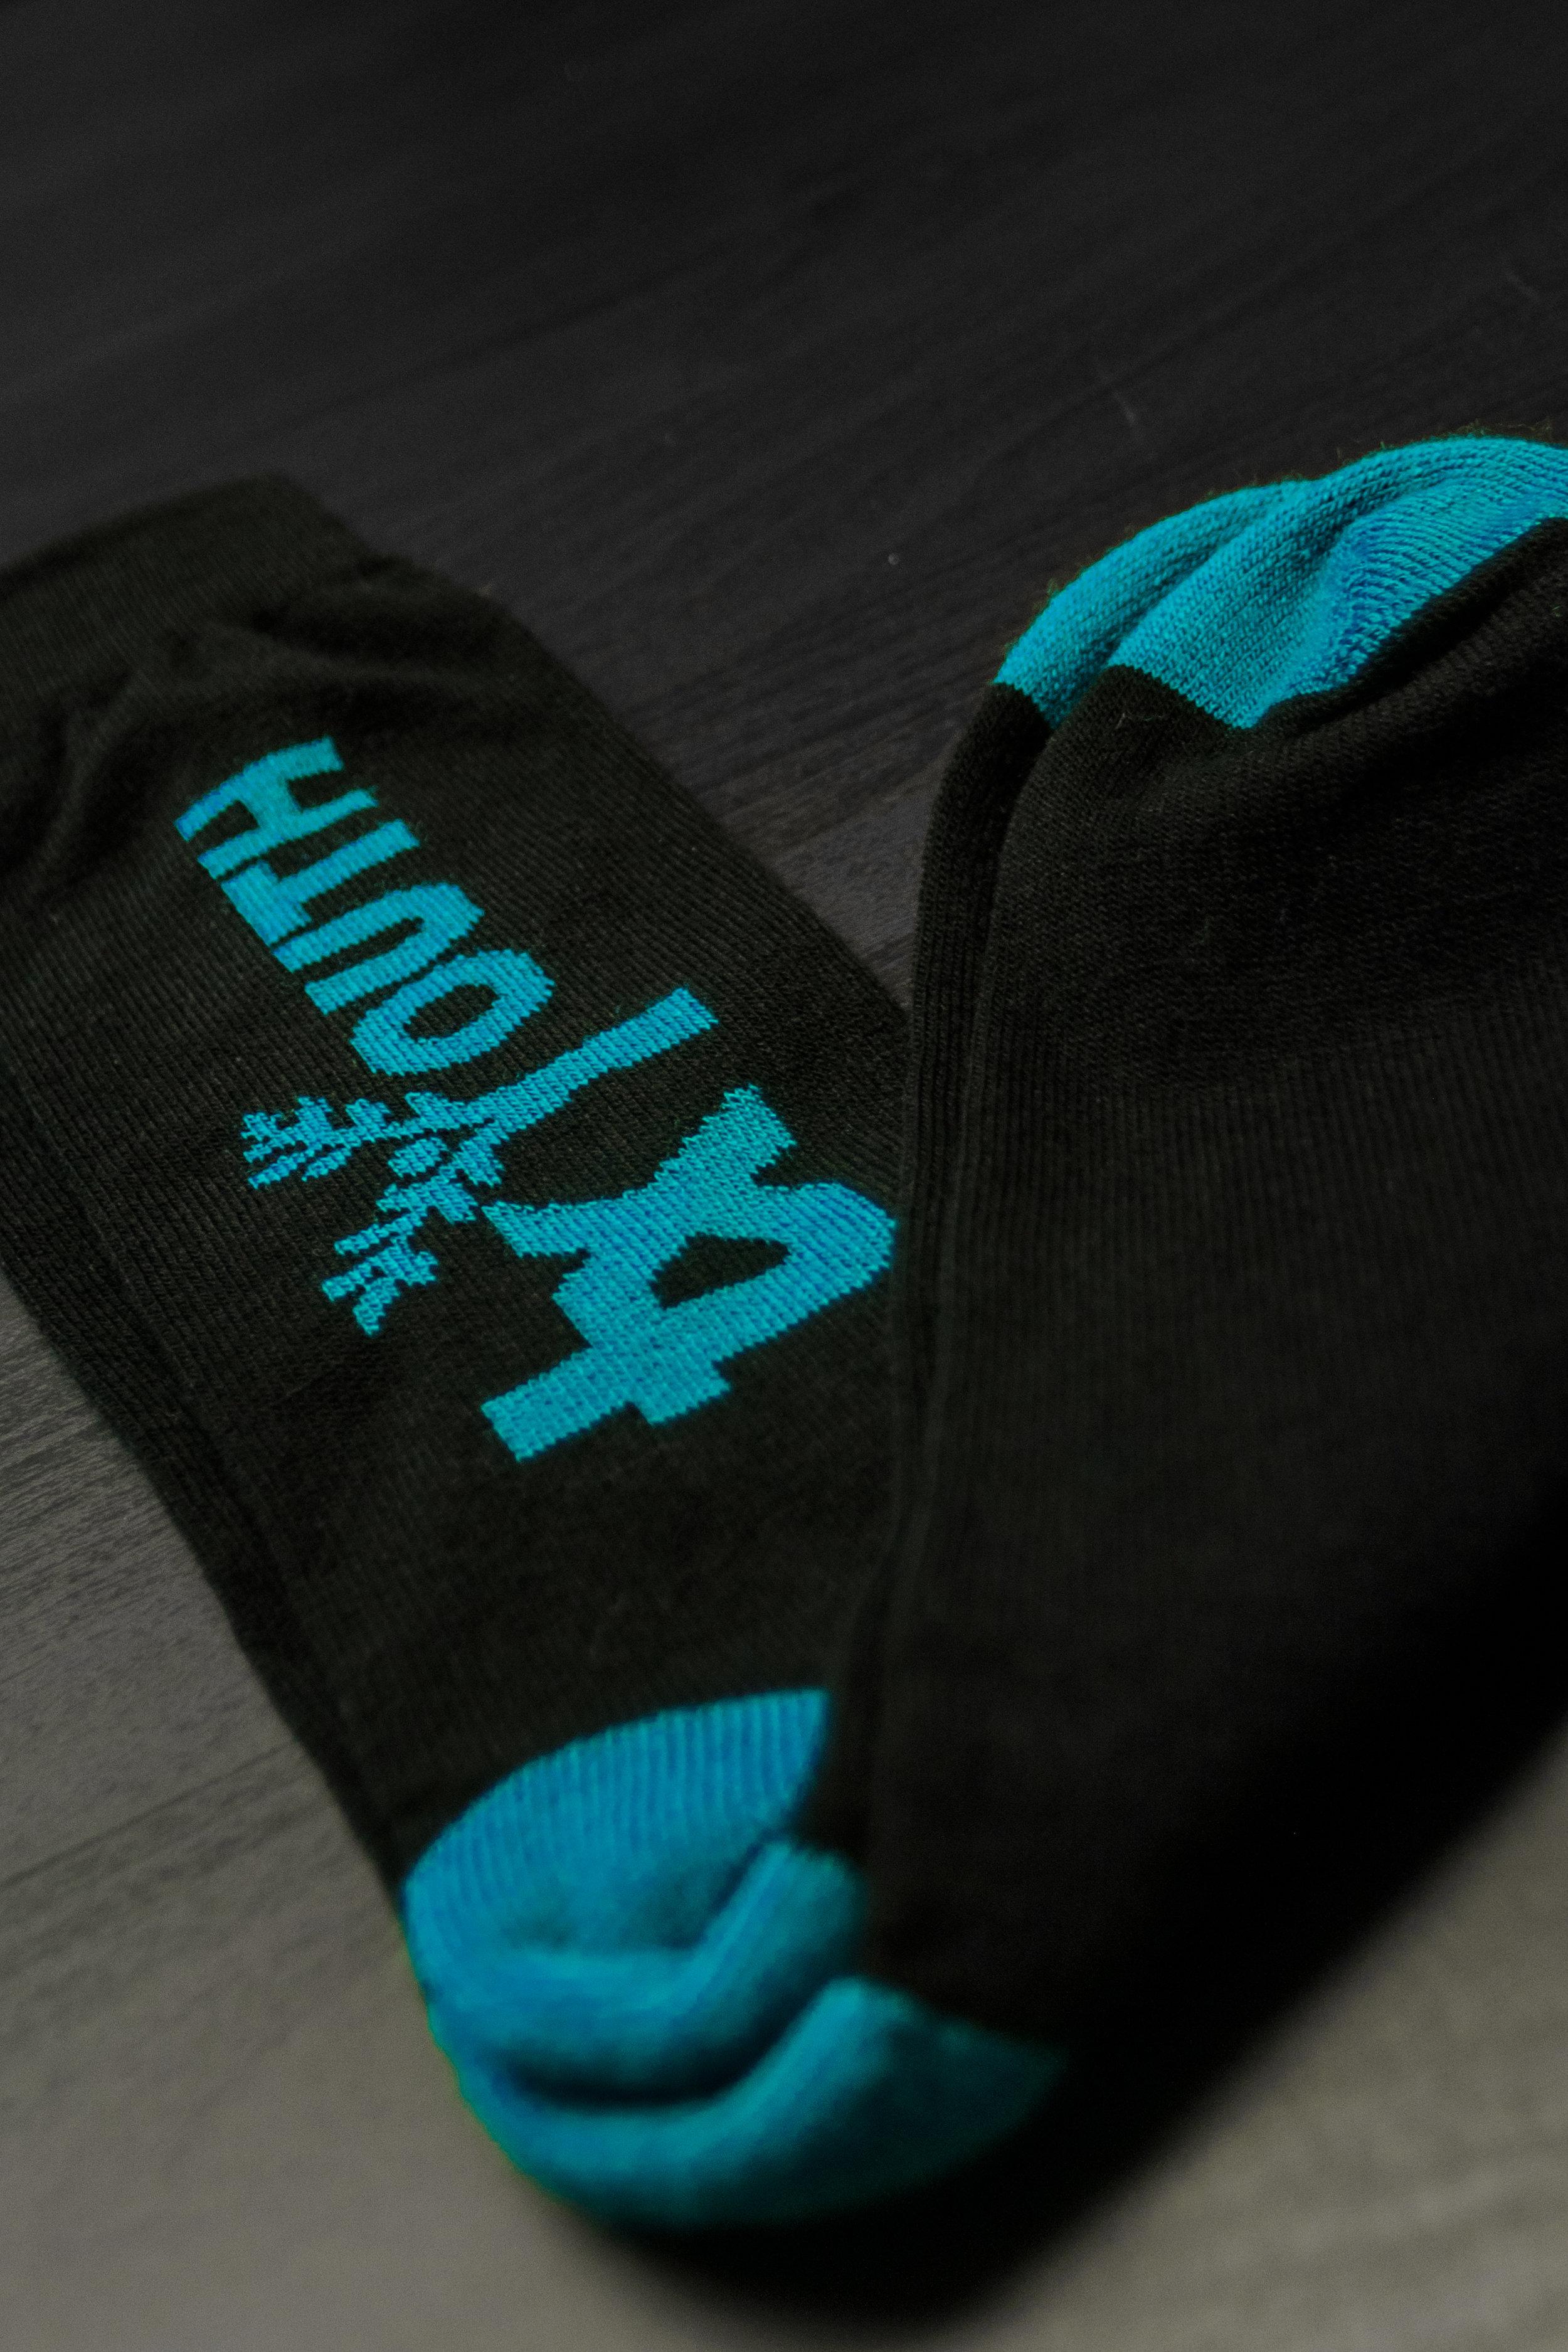 TX YOUTH -  BLUE LOGO SOCKS    $10.00